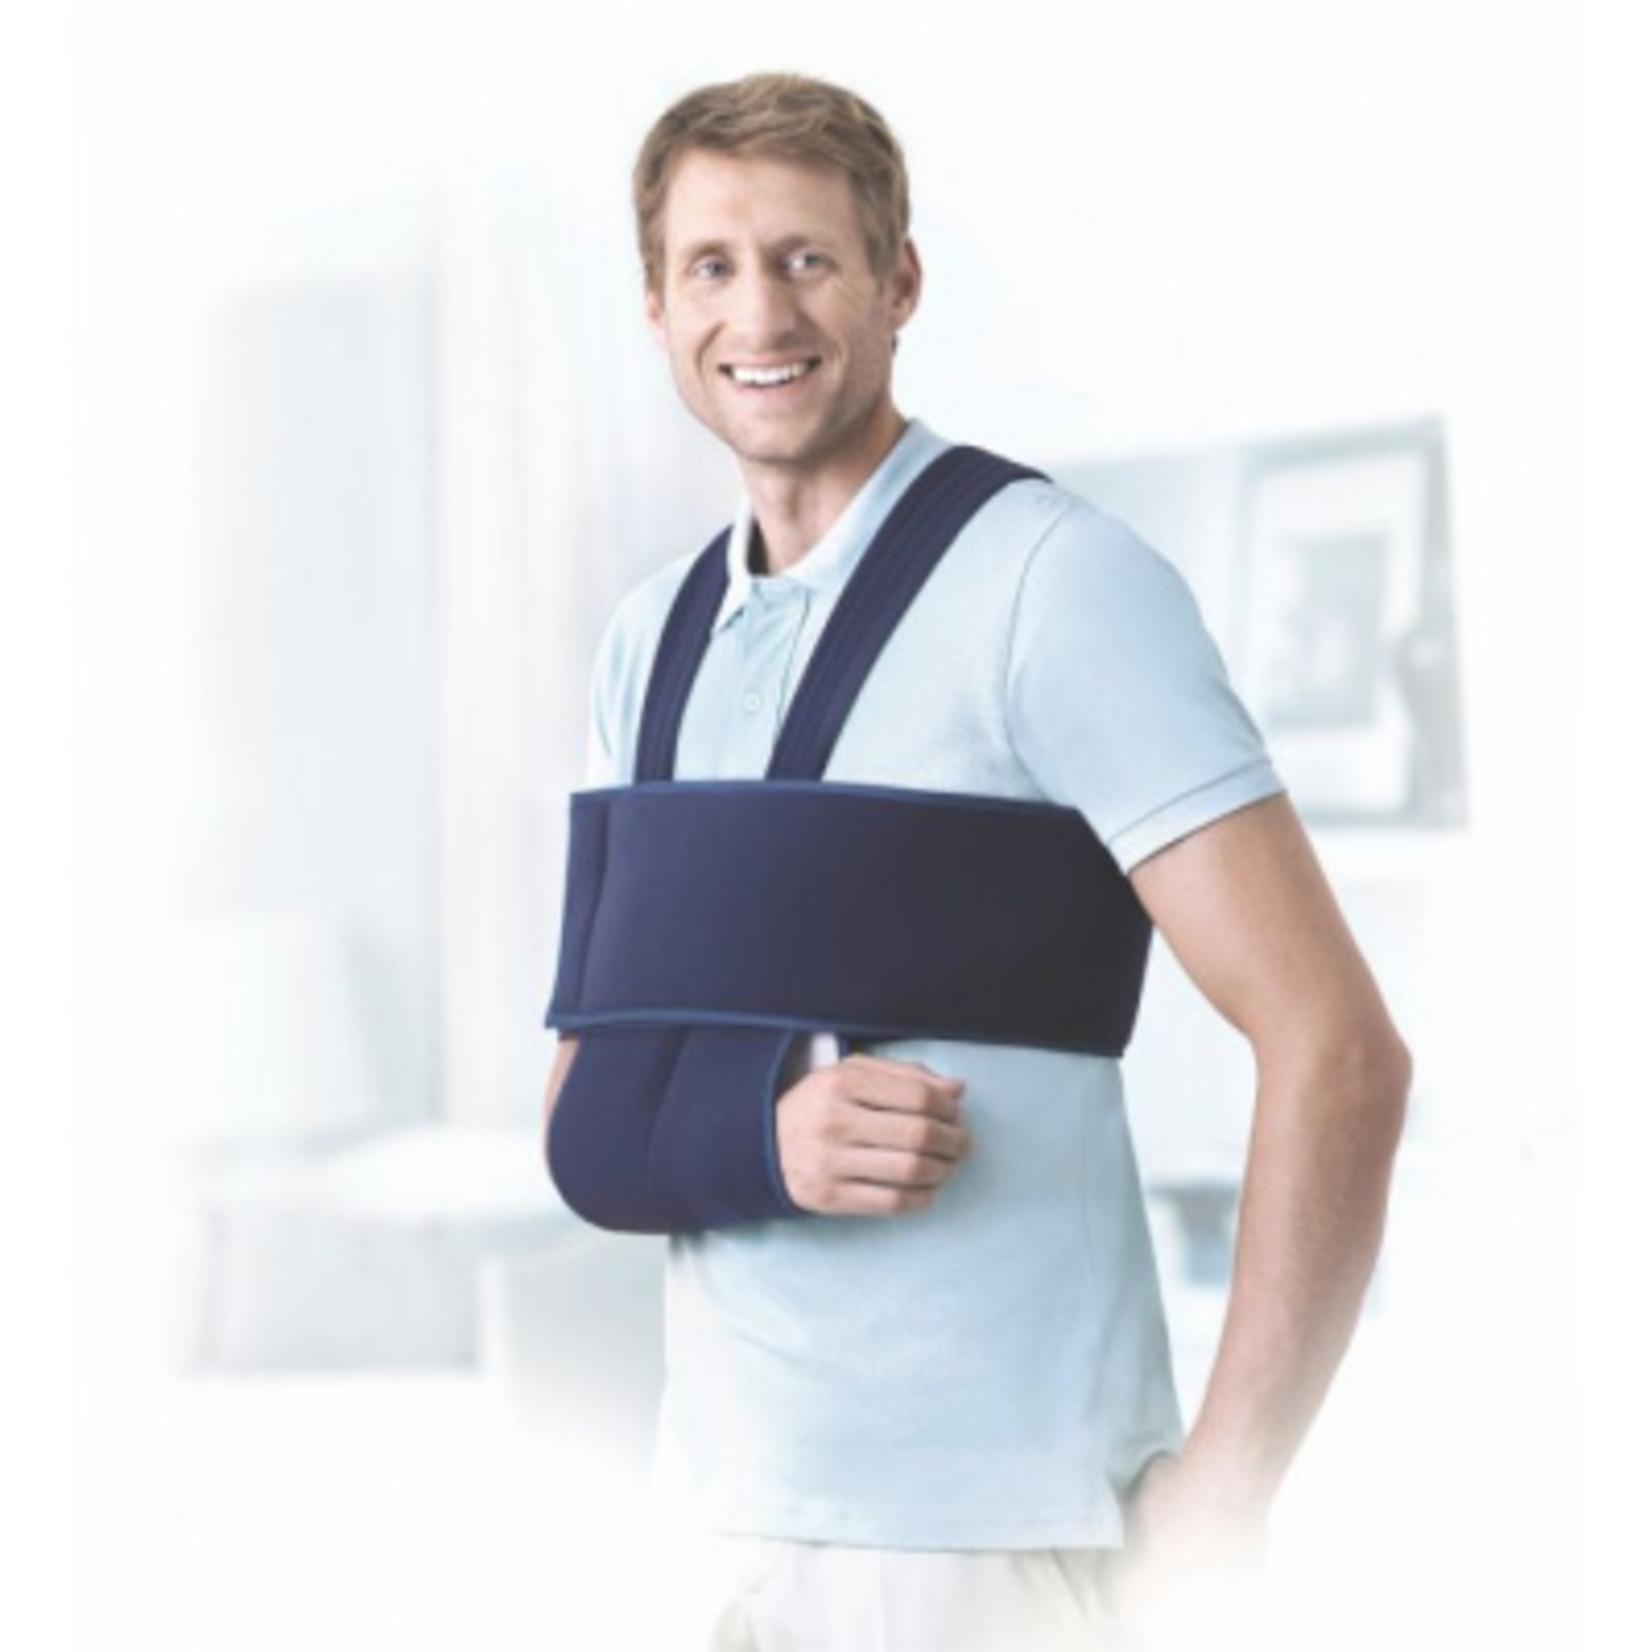 FLA Orthopedics PROLITE DELUXE SLING AND SWATHE